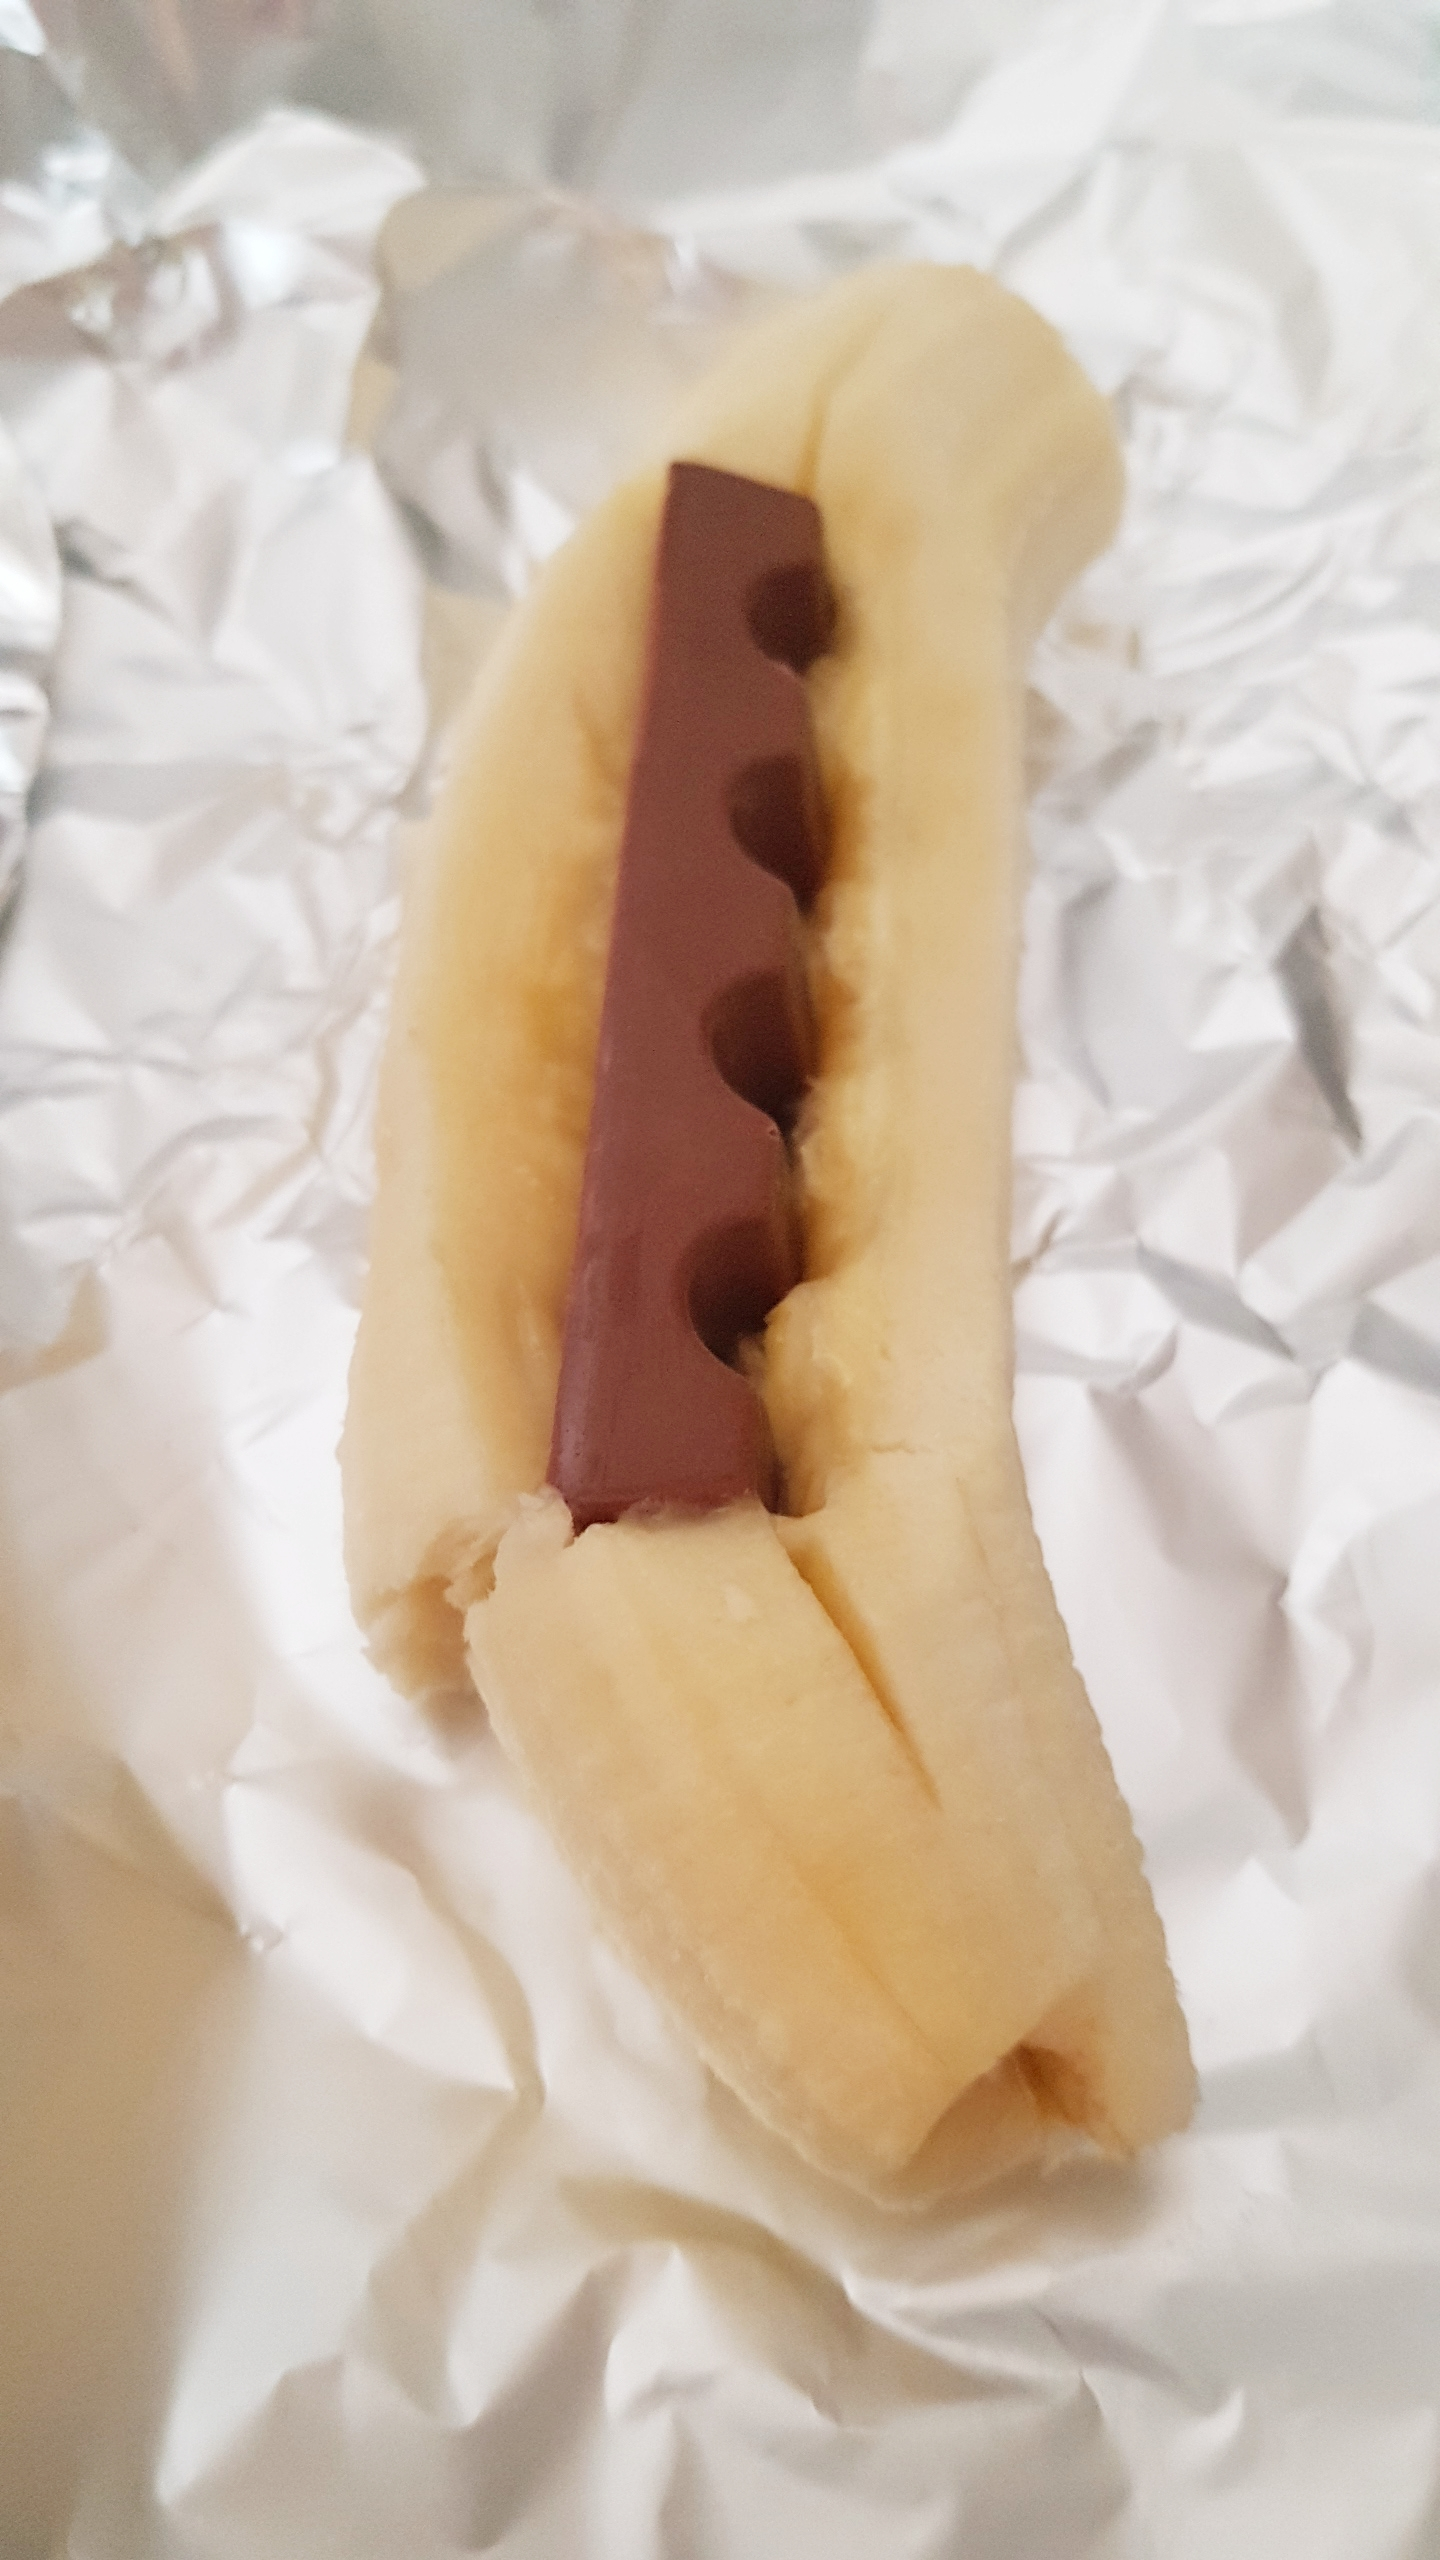 5 Kids Friendly Summer Dessert Recipes - banana split